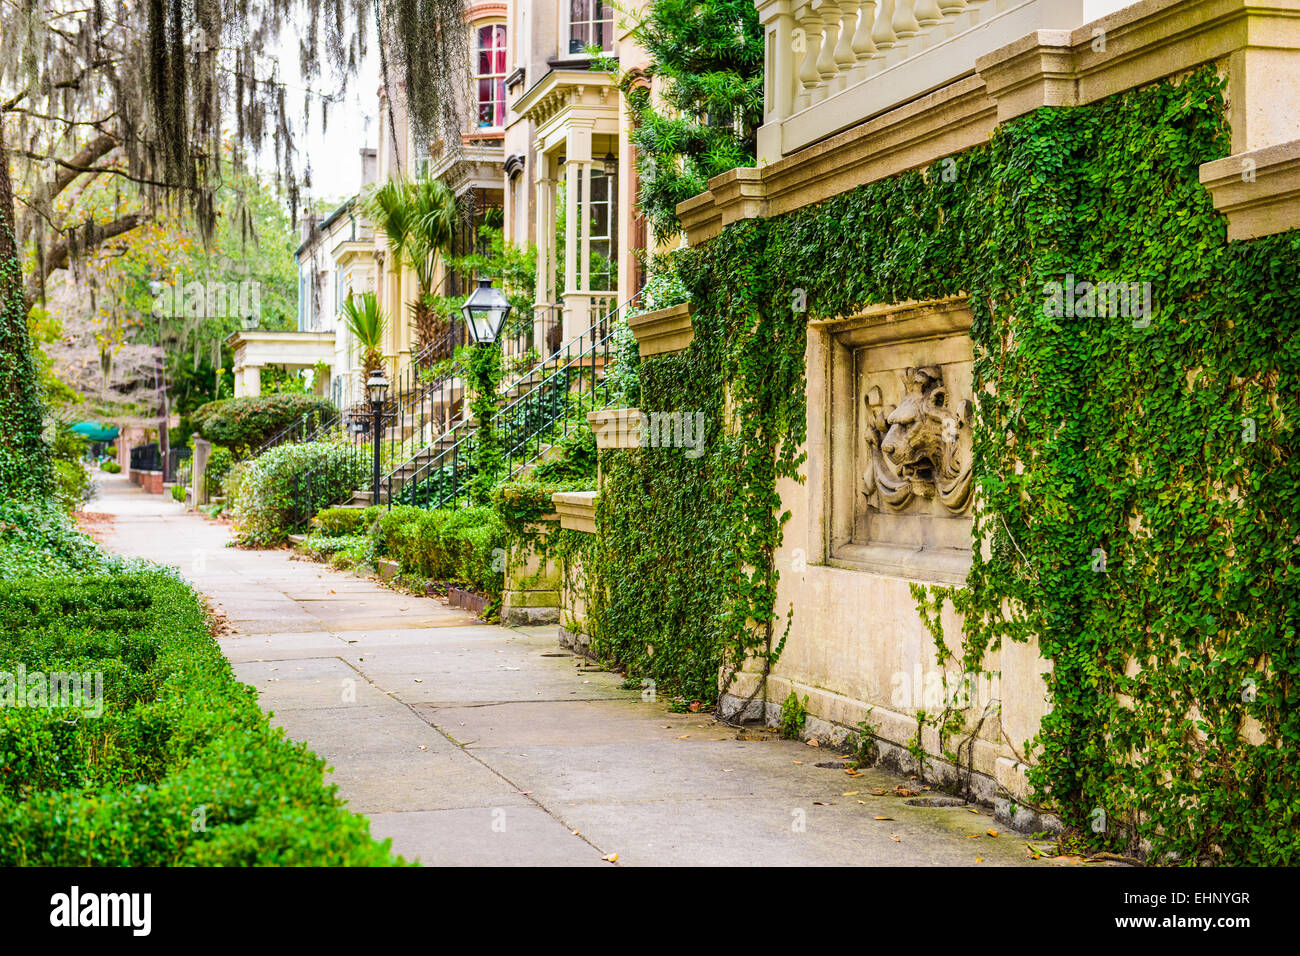 Savannah, Georgia, USA historic downtown sidewalks and rowhouses. - Stock Image